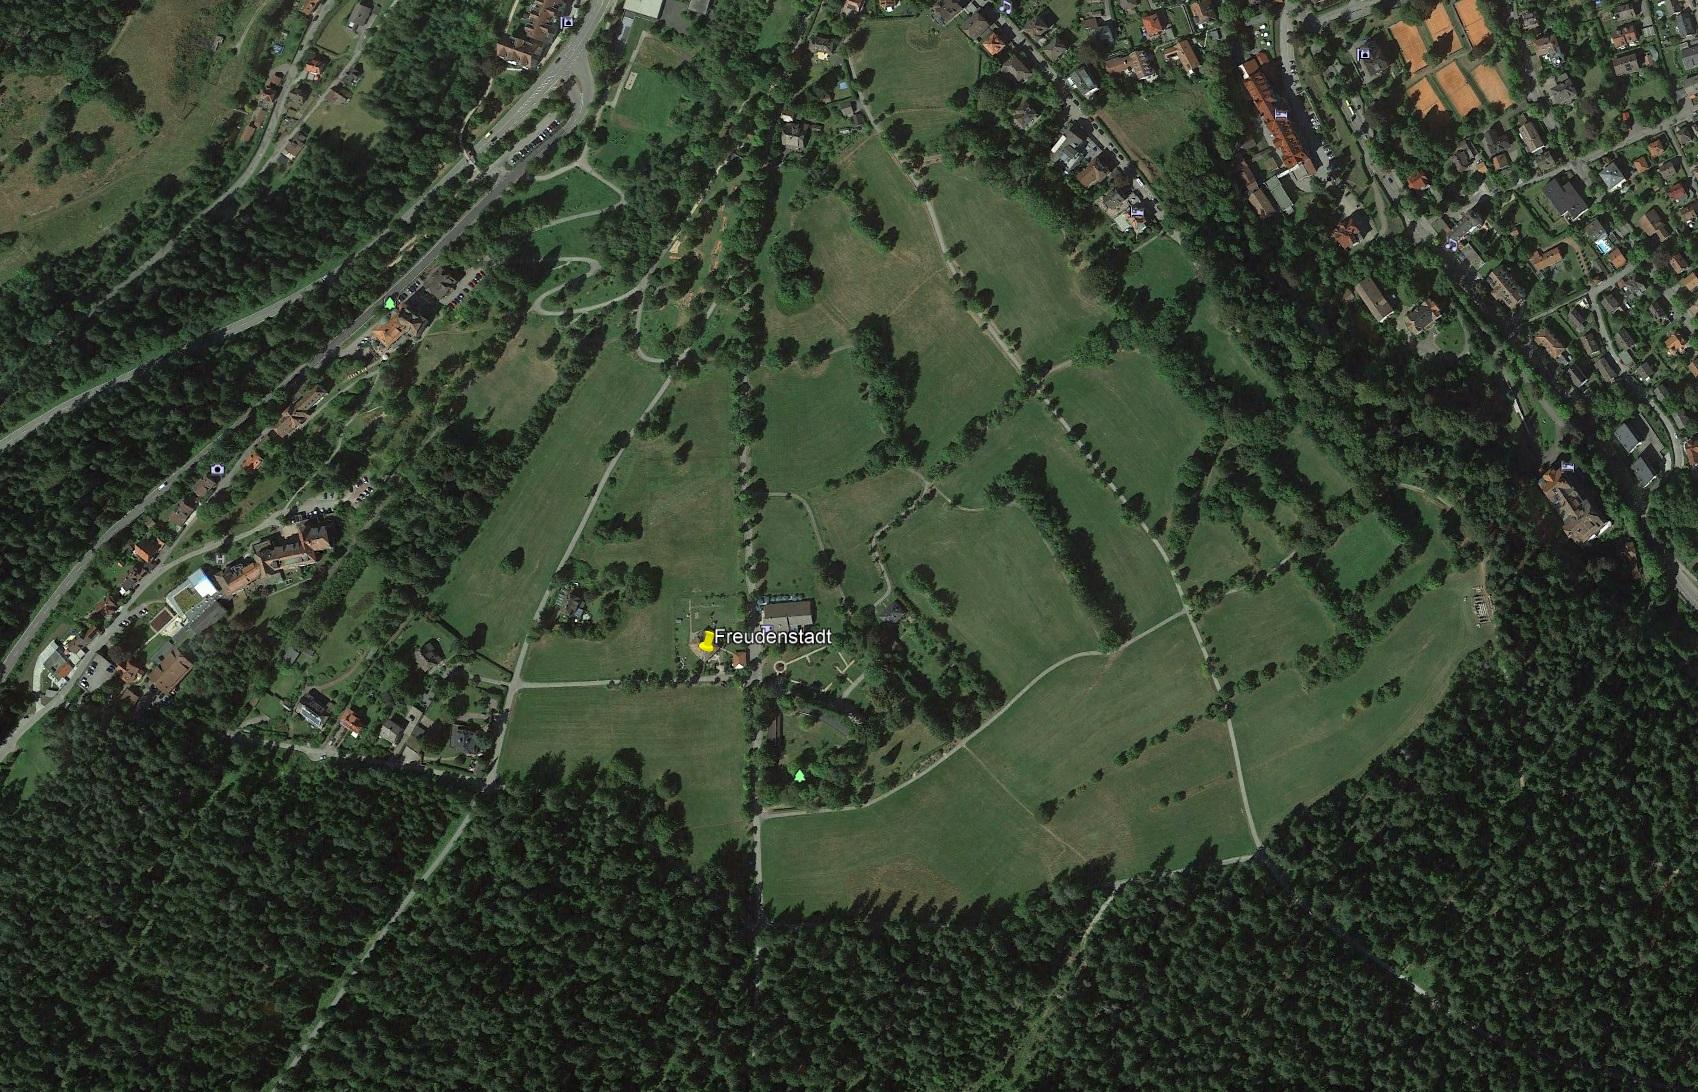 http://www.wetterstation-leutenbach.de/Bilder/freudenstadt0_2.jpg